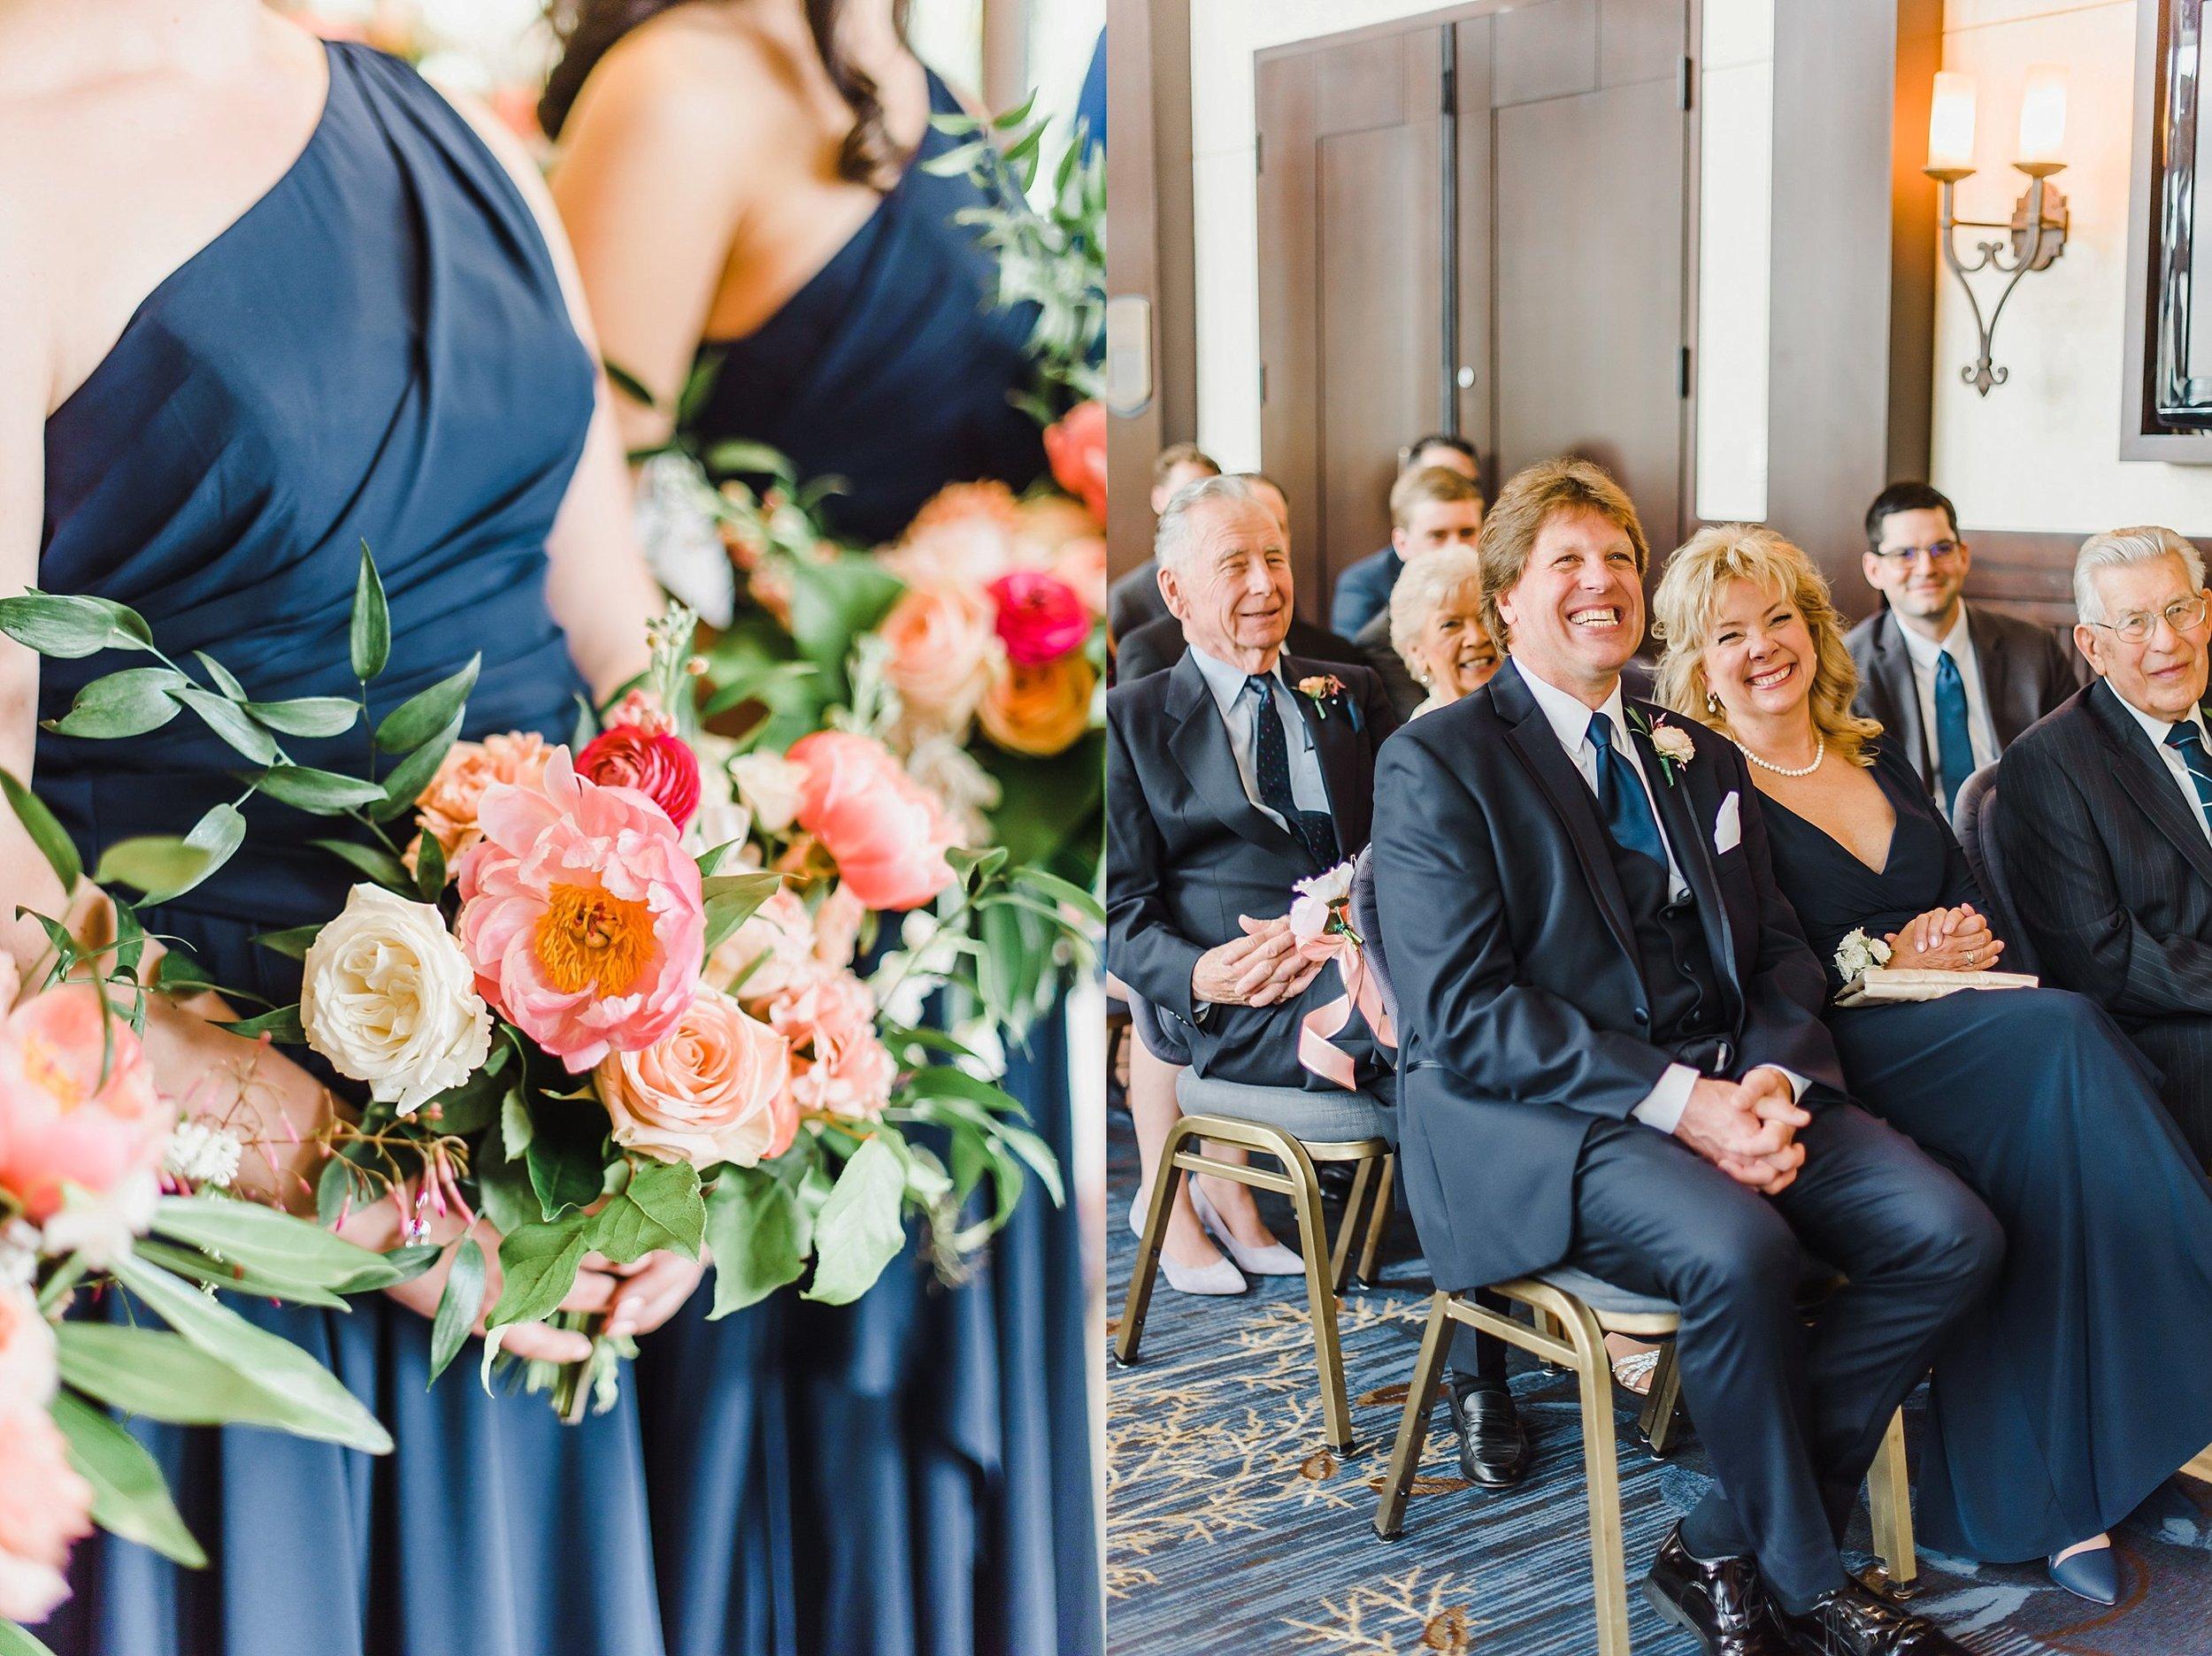 light airy indie fine art ottawa wedding photographer | Ali and Batoul Photography_0166.jpg